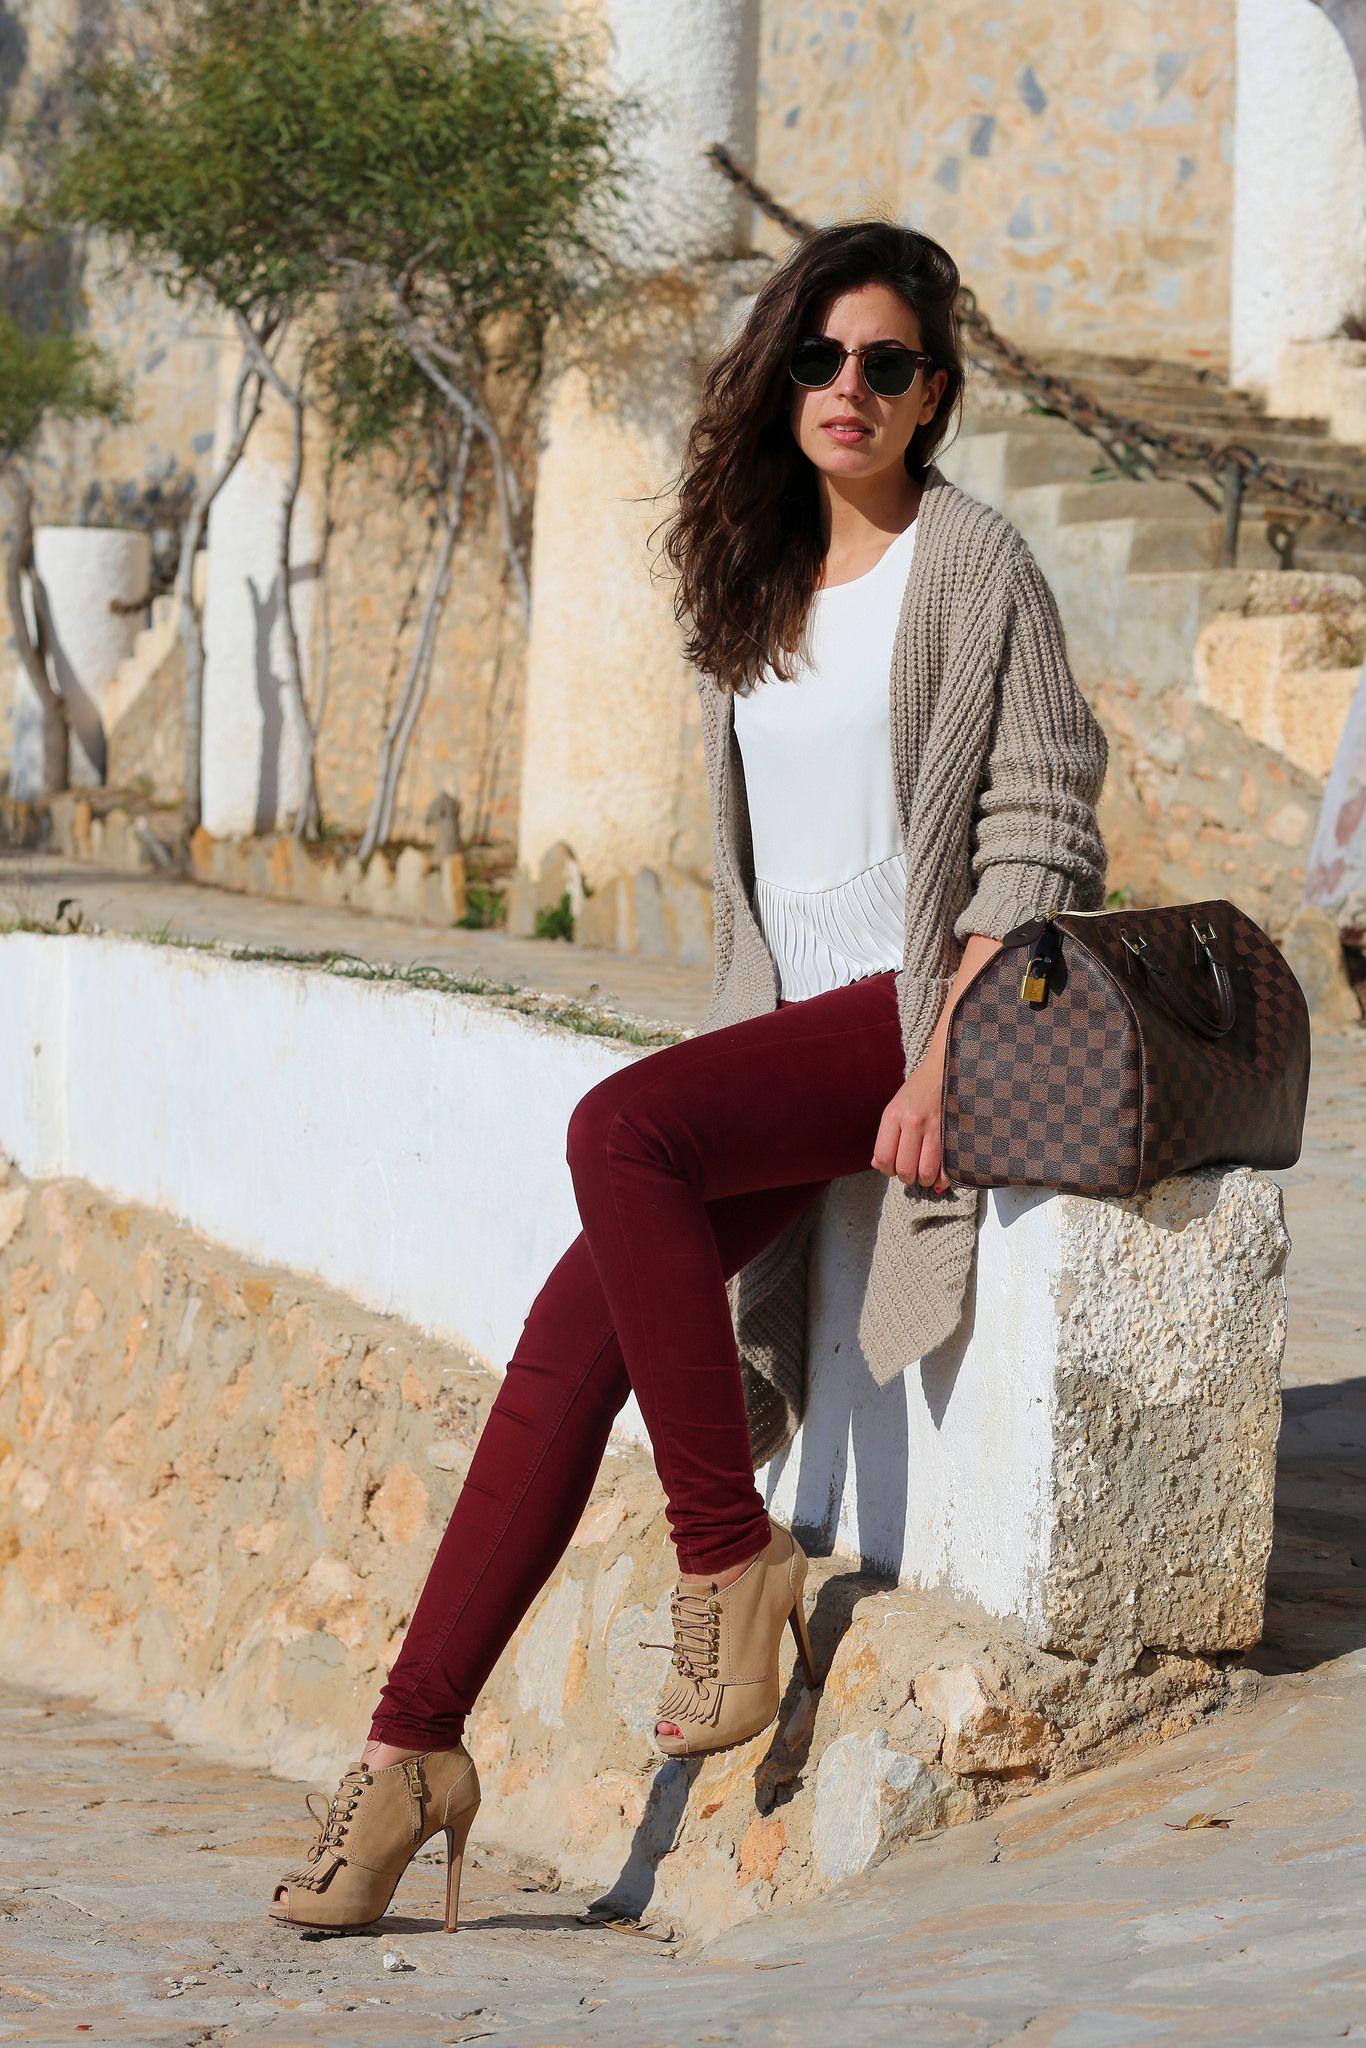 Pantalon Vino Outfit Pinterest Pantalones Vino Ropa Y Invierno